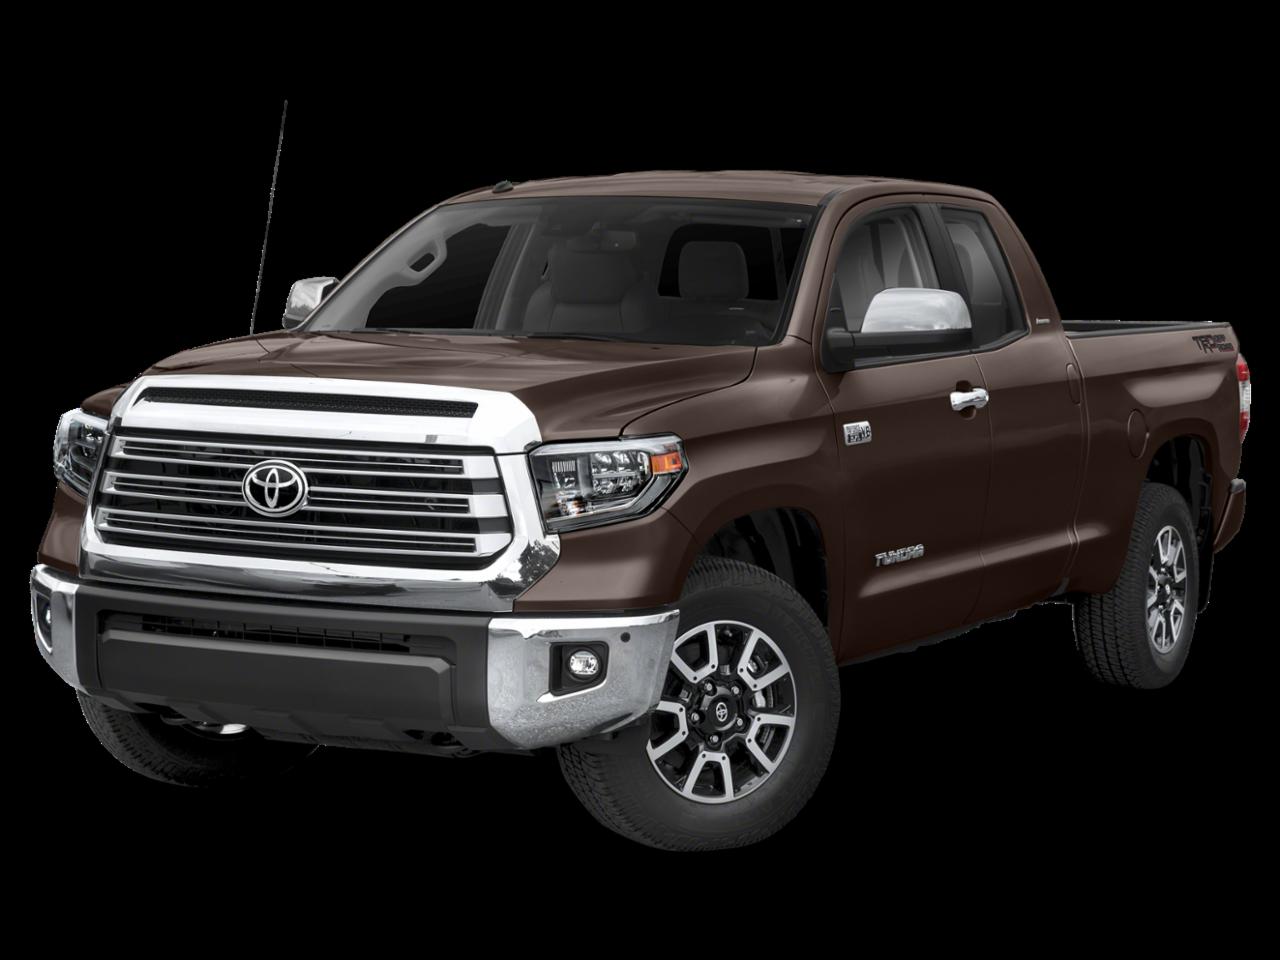 Toyota 2020 Tundra 4WD Limited